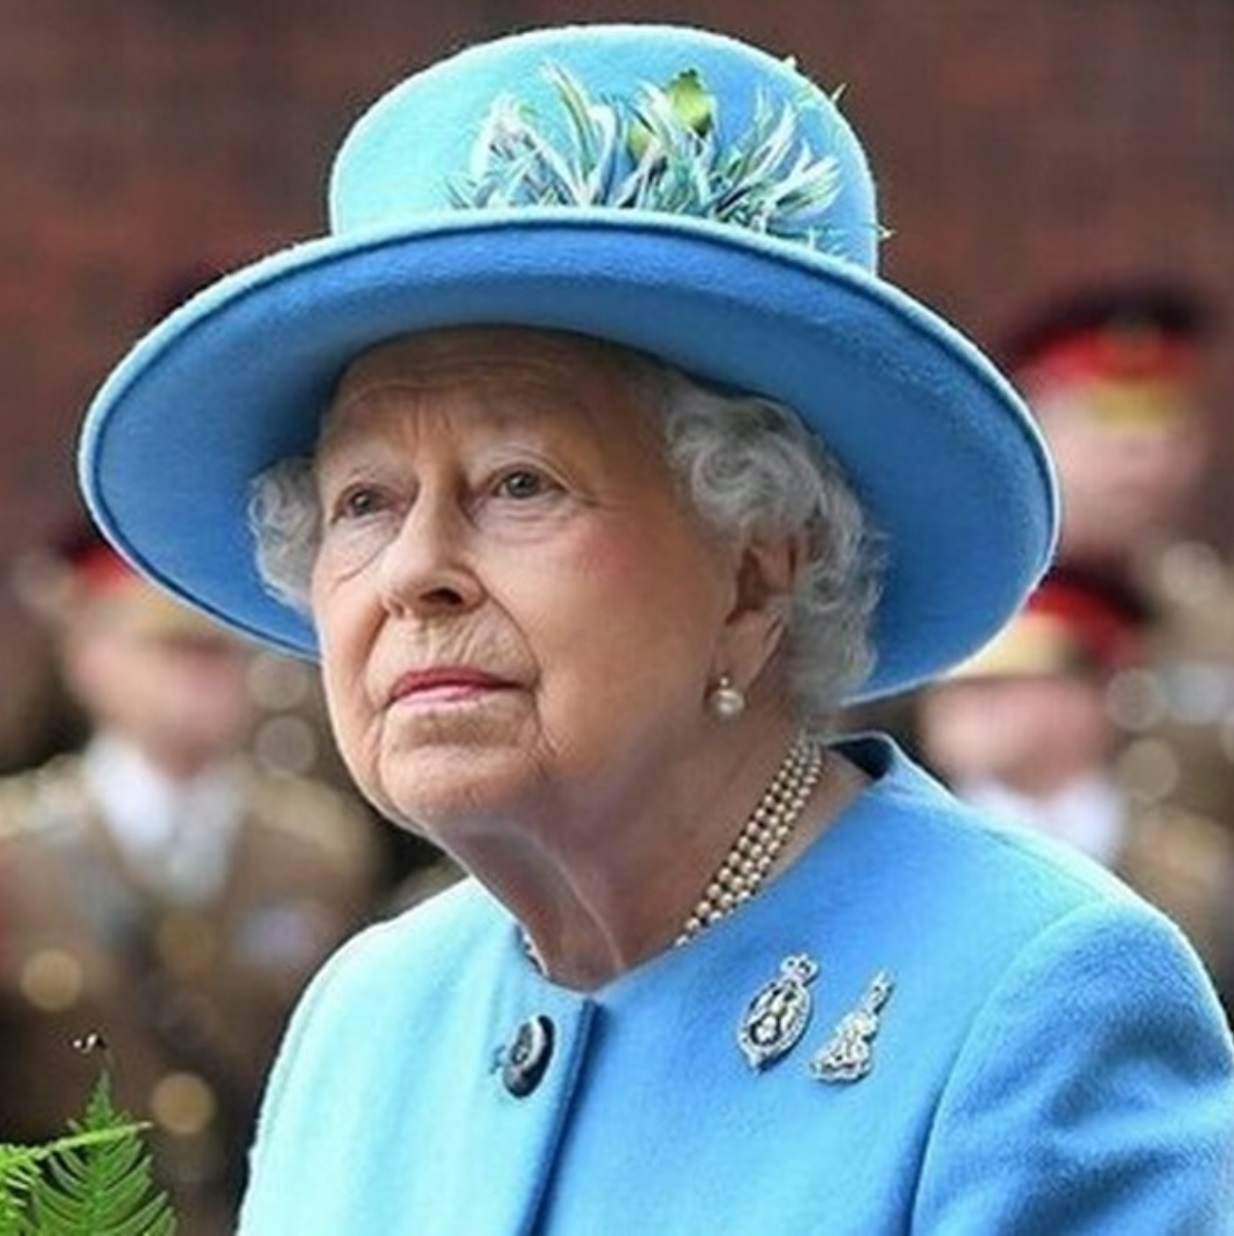 regina elisabetta principe carlo lite